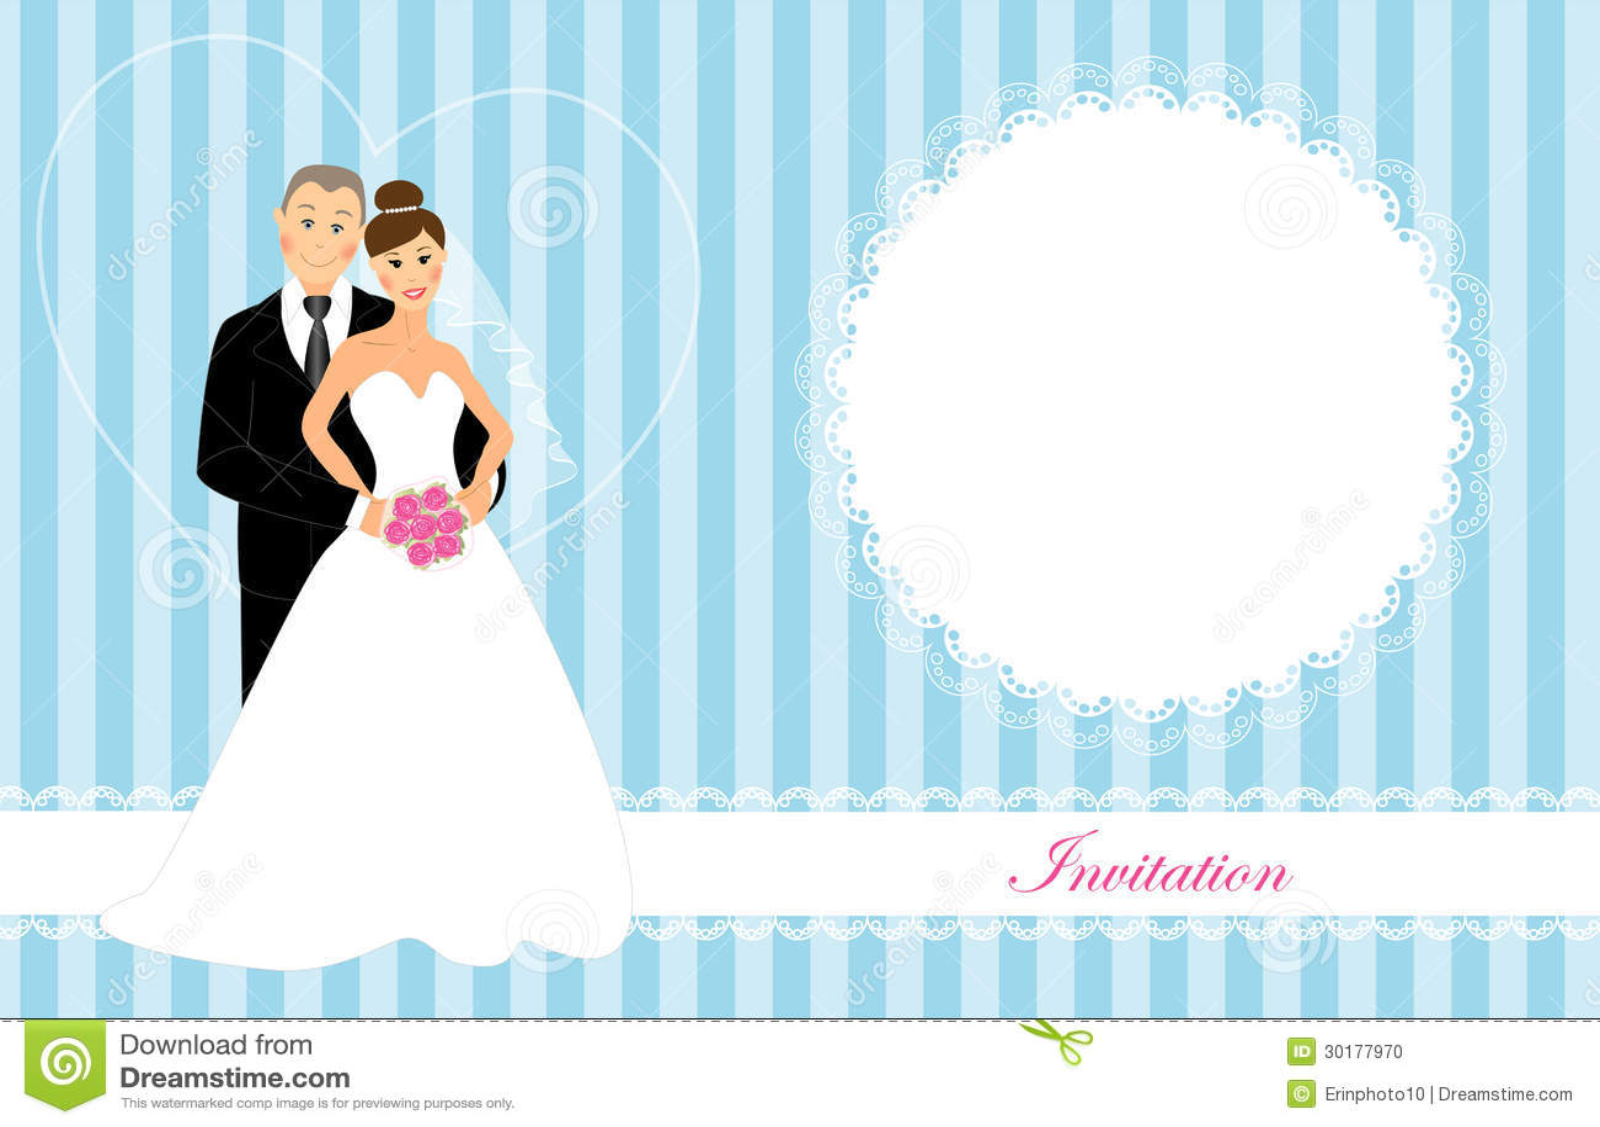 Blue Wedding Invitation Background: Wedding Invitation 4 Stock Illustration. Illustration Of